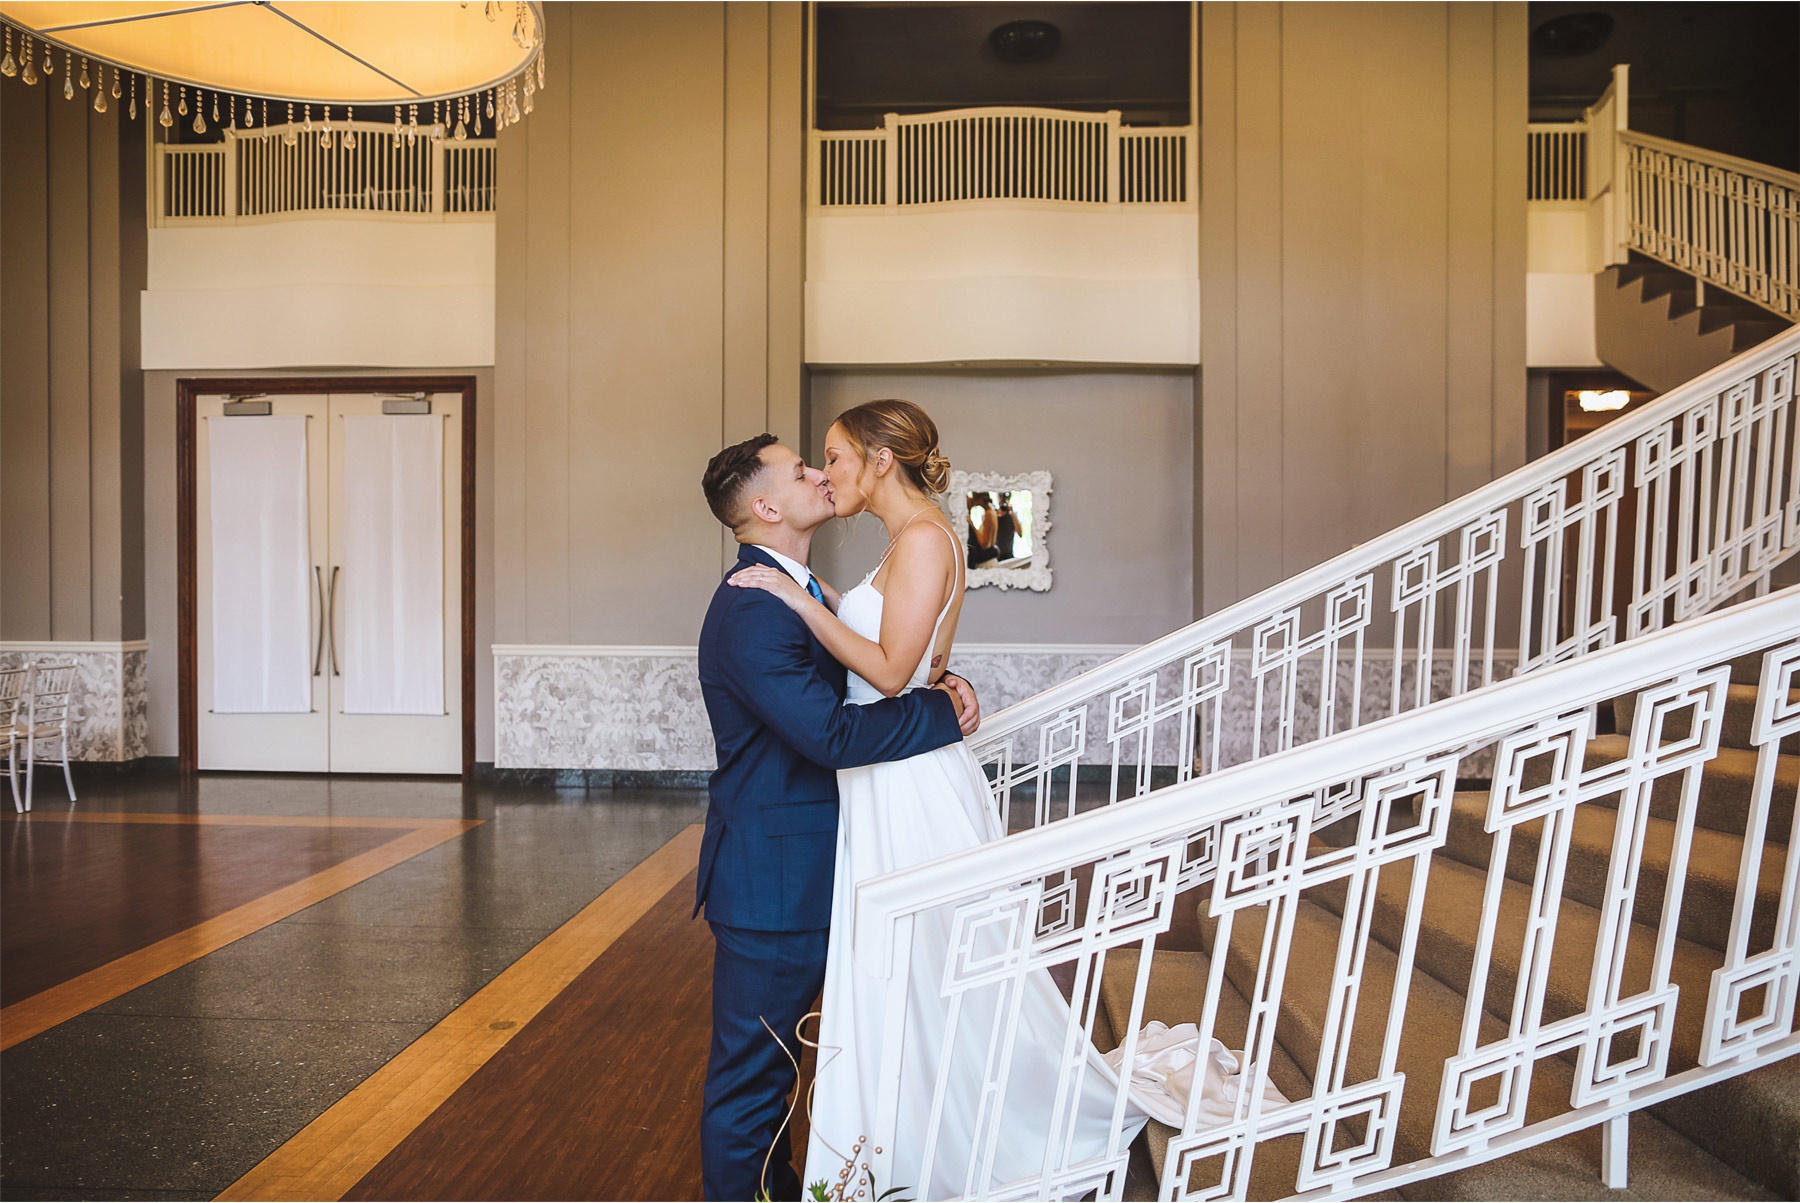 04-Minneapolis-Minnesota-Wedding-Andrew-Vick-Photography-Calhoun-Beach-Club-Bride-Groom-First-Look-Staircase-Samantha-and-Ryan.jpg